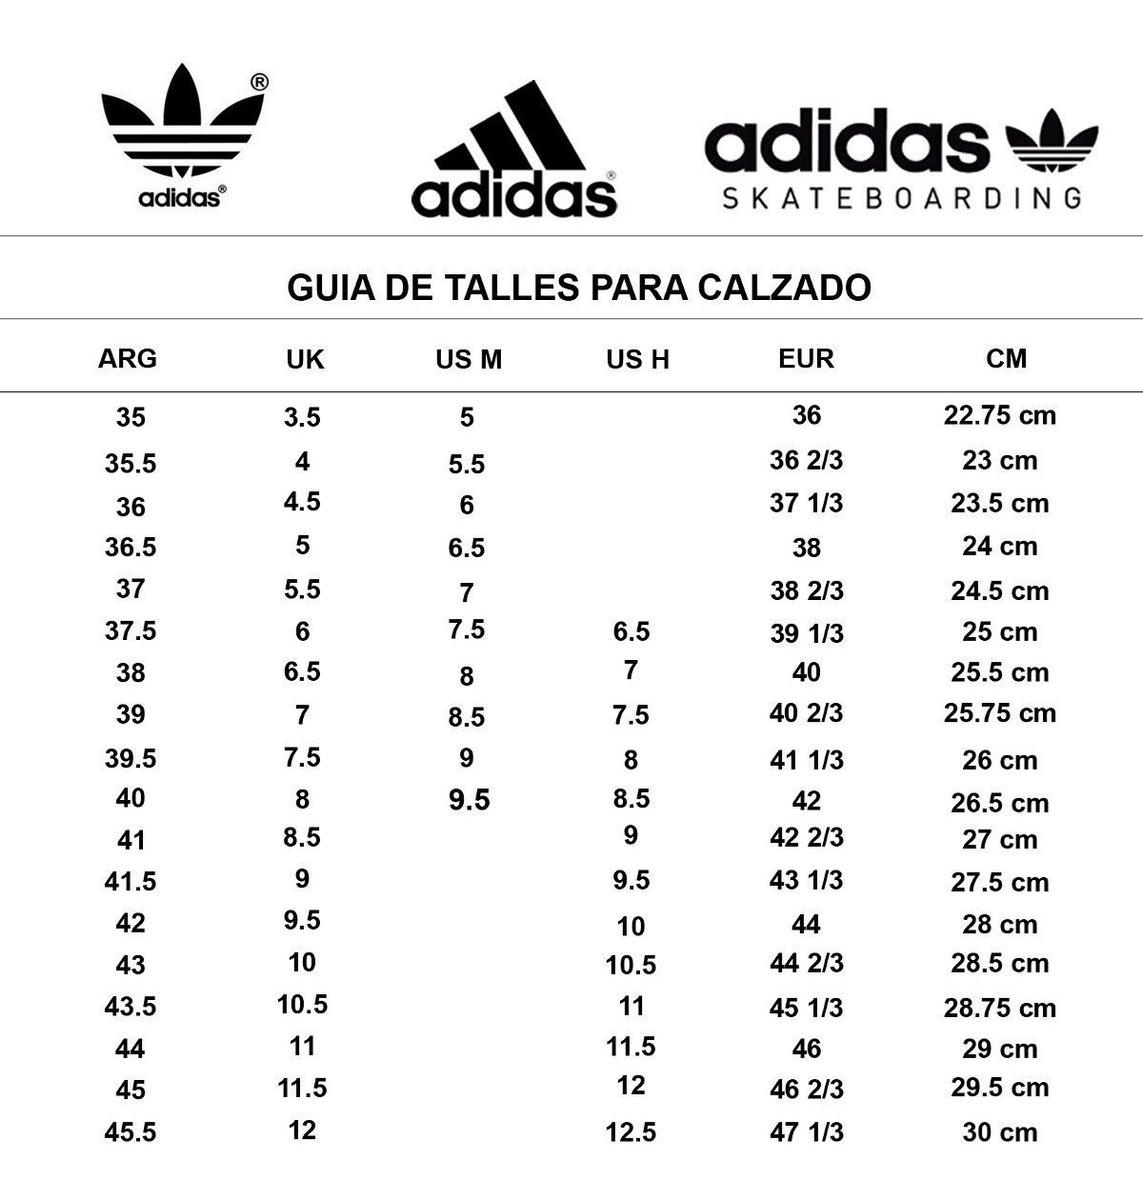 adidas us 7.5 to cm 2019